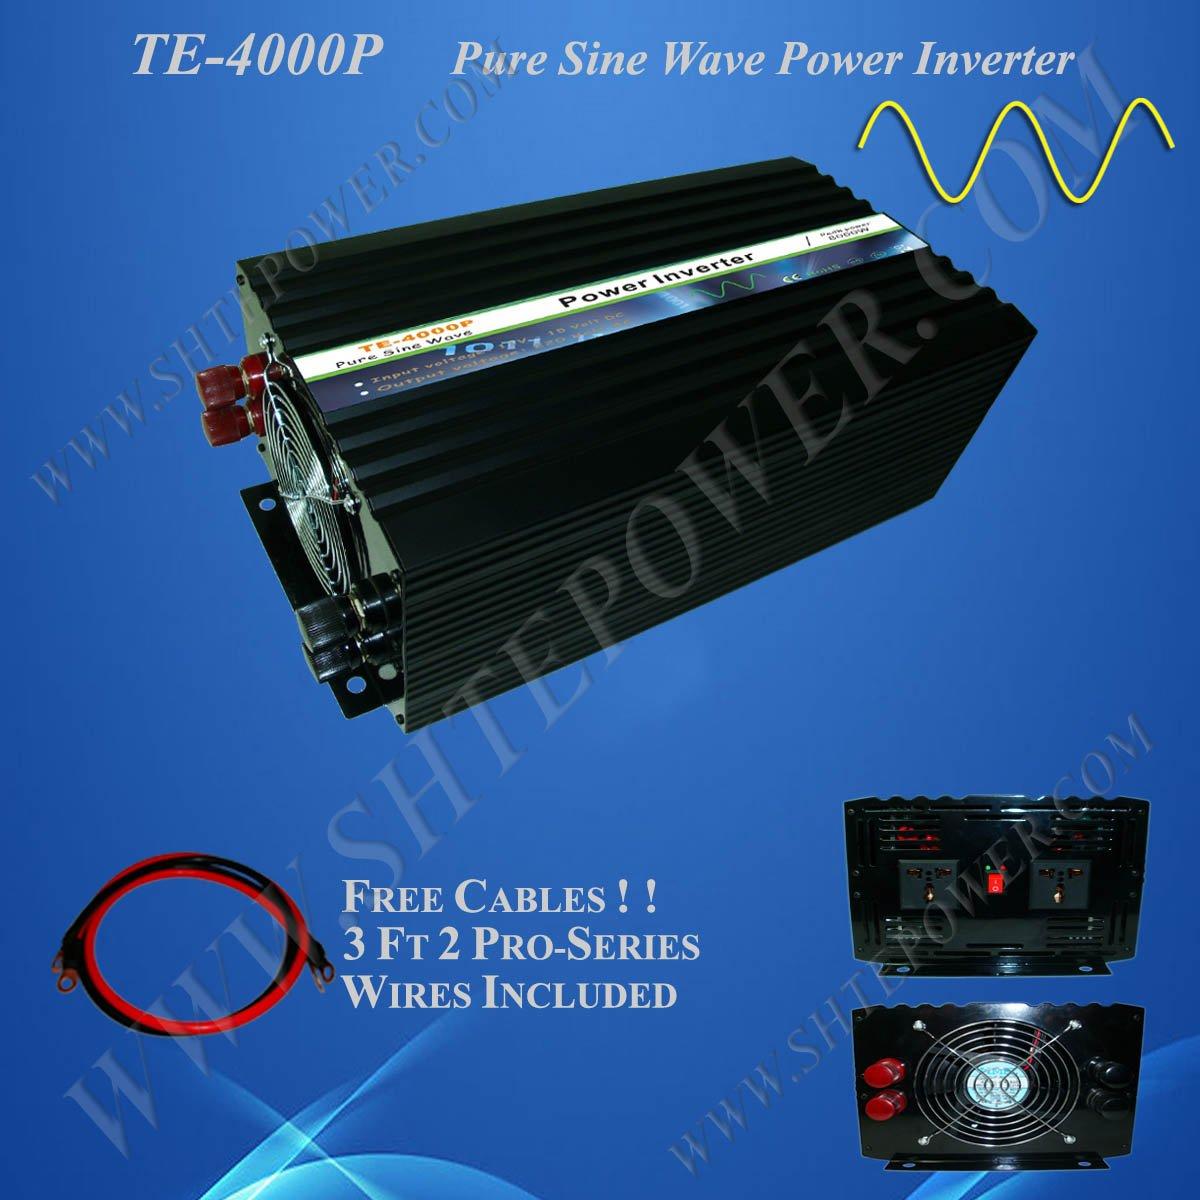 24v dc to 120v ac pure sine wave 4000w inverter 110v power inverter